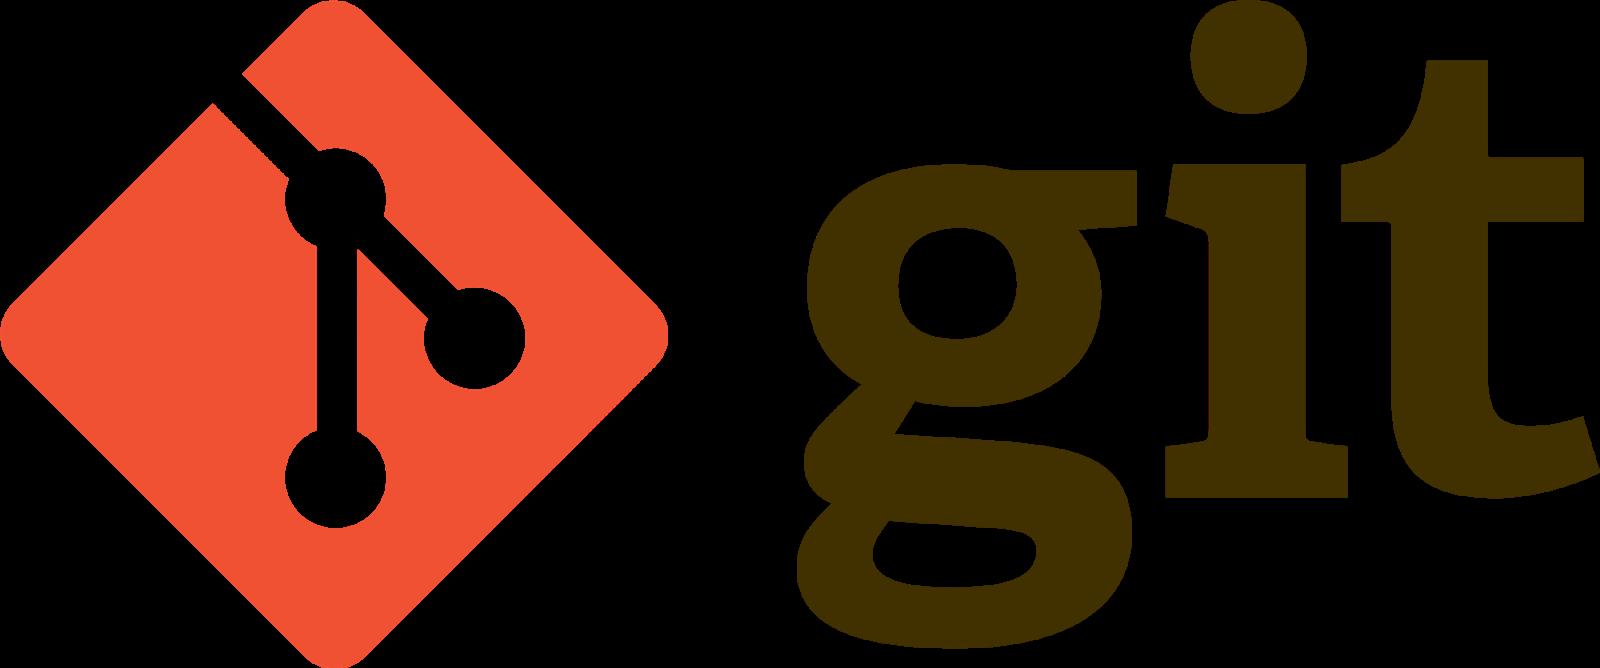 git_fedorafans.com